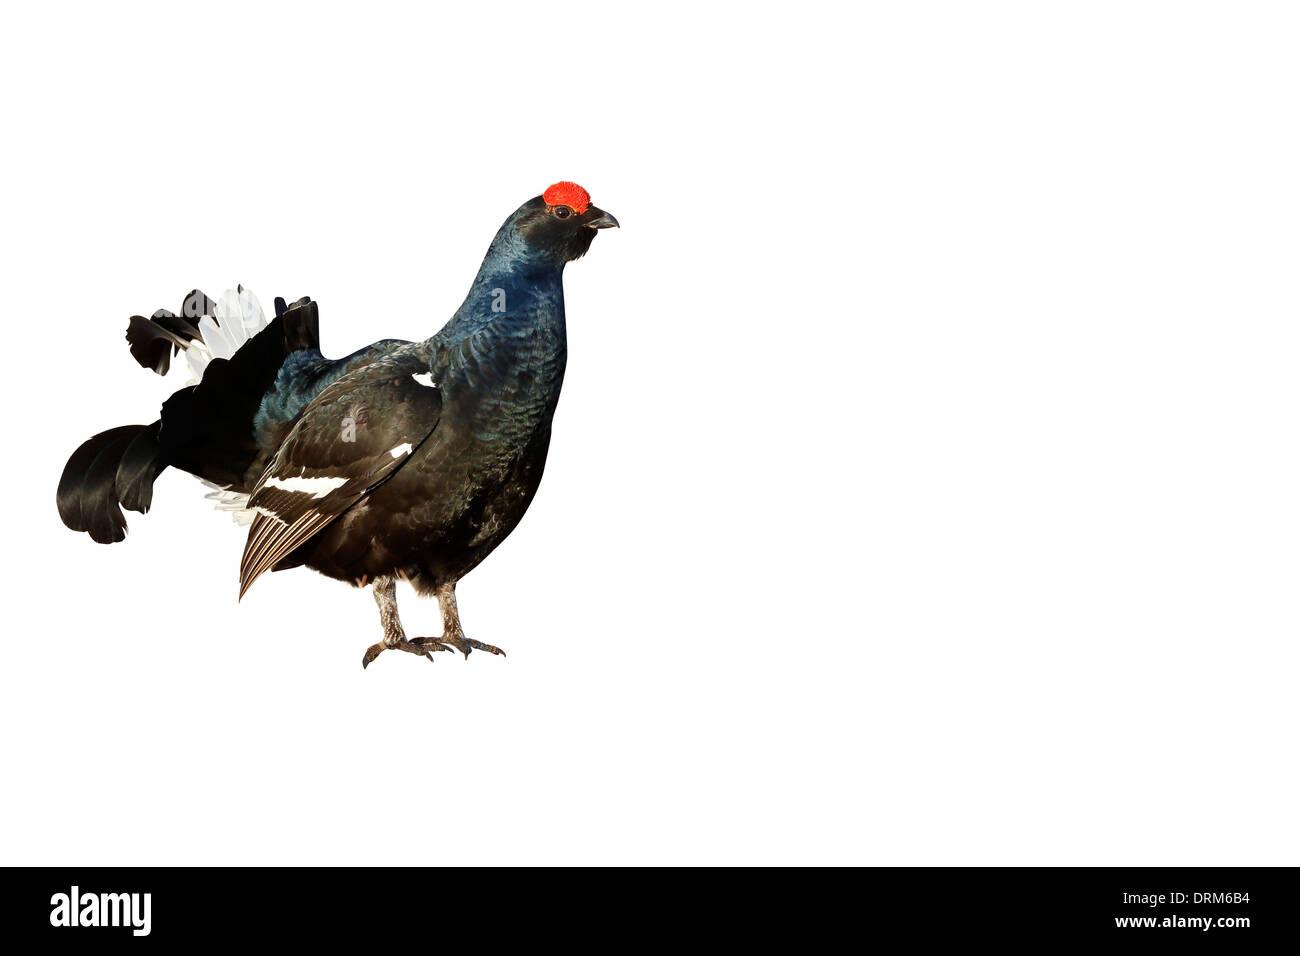 Black grouse, Tetrao tetrix, single male in marsh land, Finland, April 2013 - Stock Image